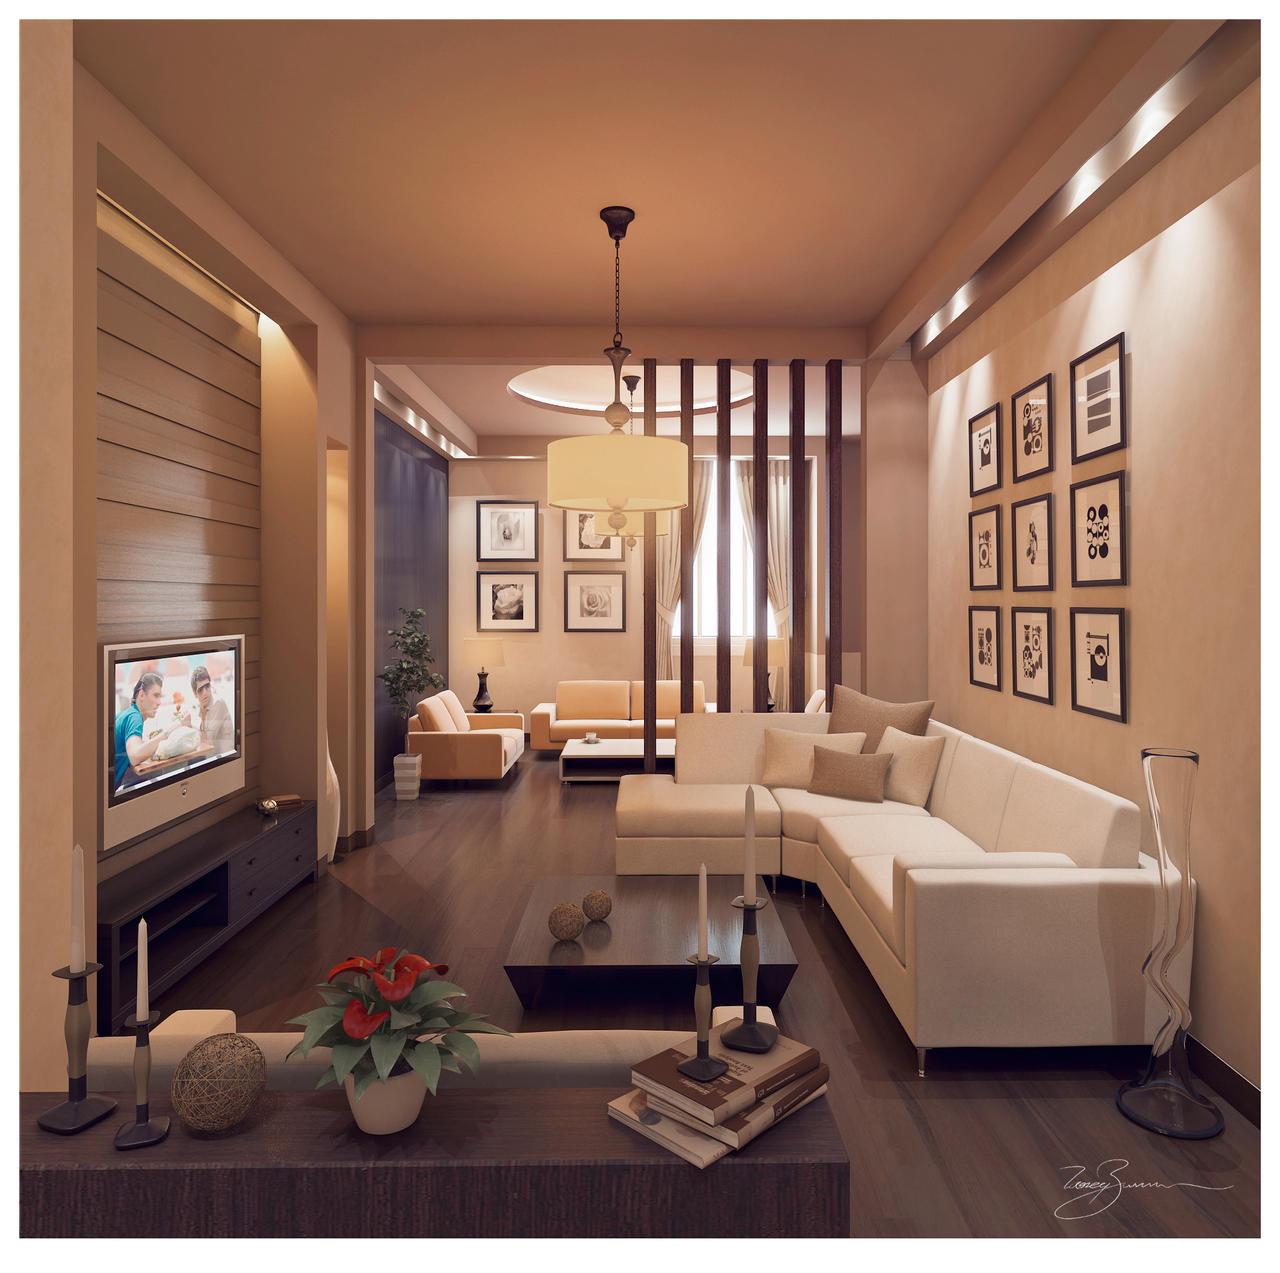 Cozyliving by TareqBanama